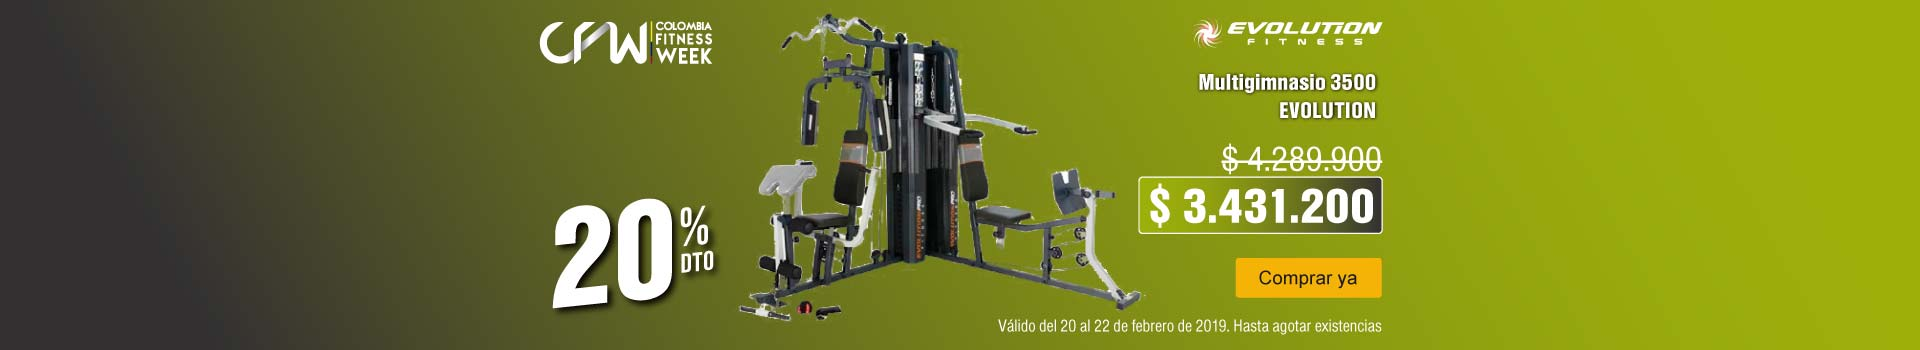 AK-KT-BCAT-1-deportes-COLFITWEEK-Multigimnasio3500-20dcto-Feb20-D